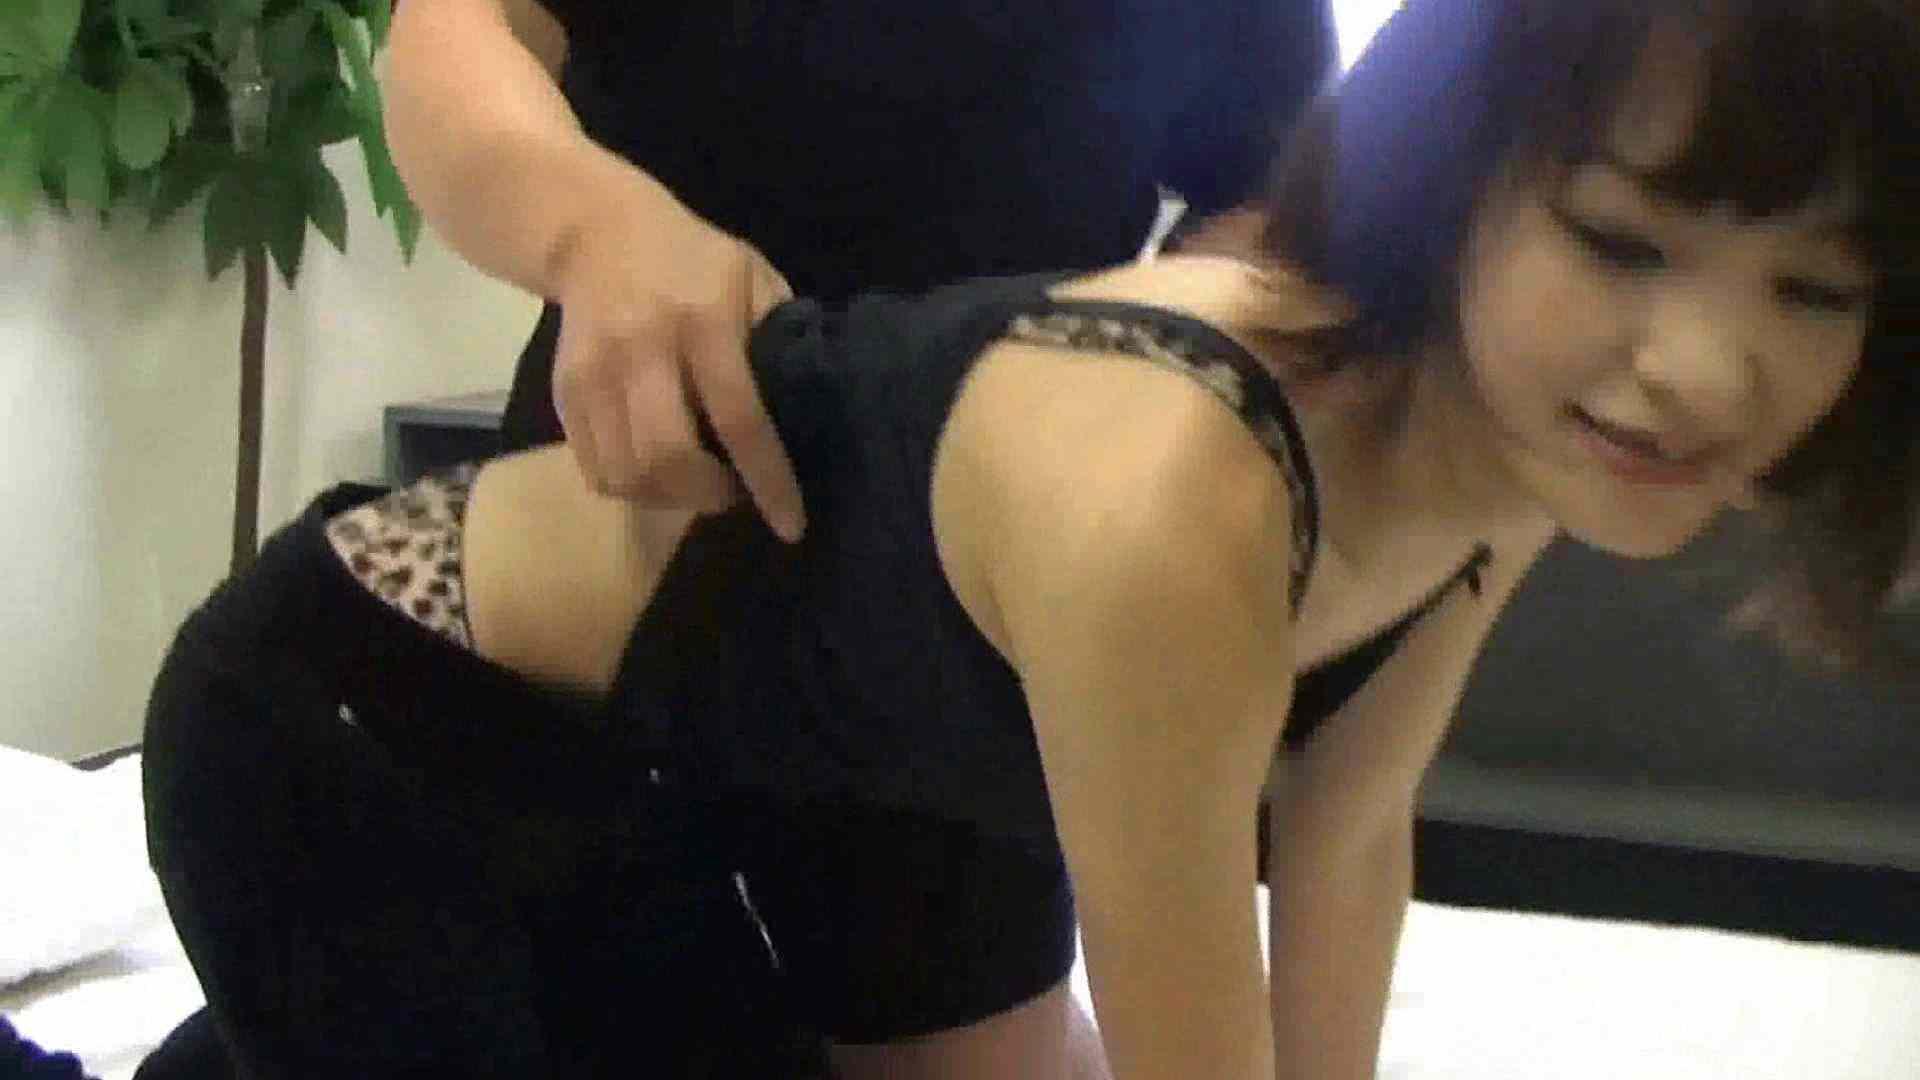 S級厳選美女ビッチガールVol.26 ギャルヌード おまんこ無修正動画無料 72画像 22